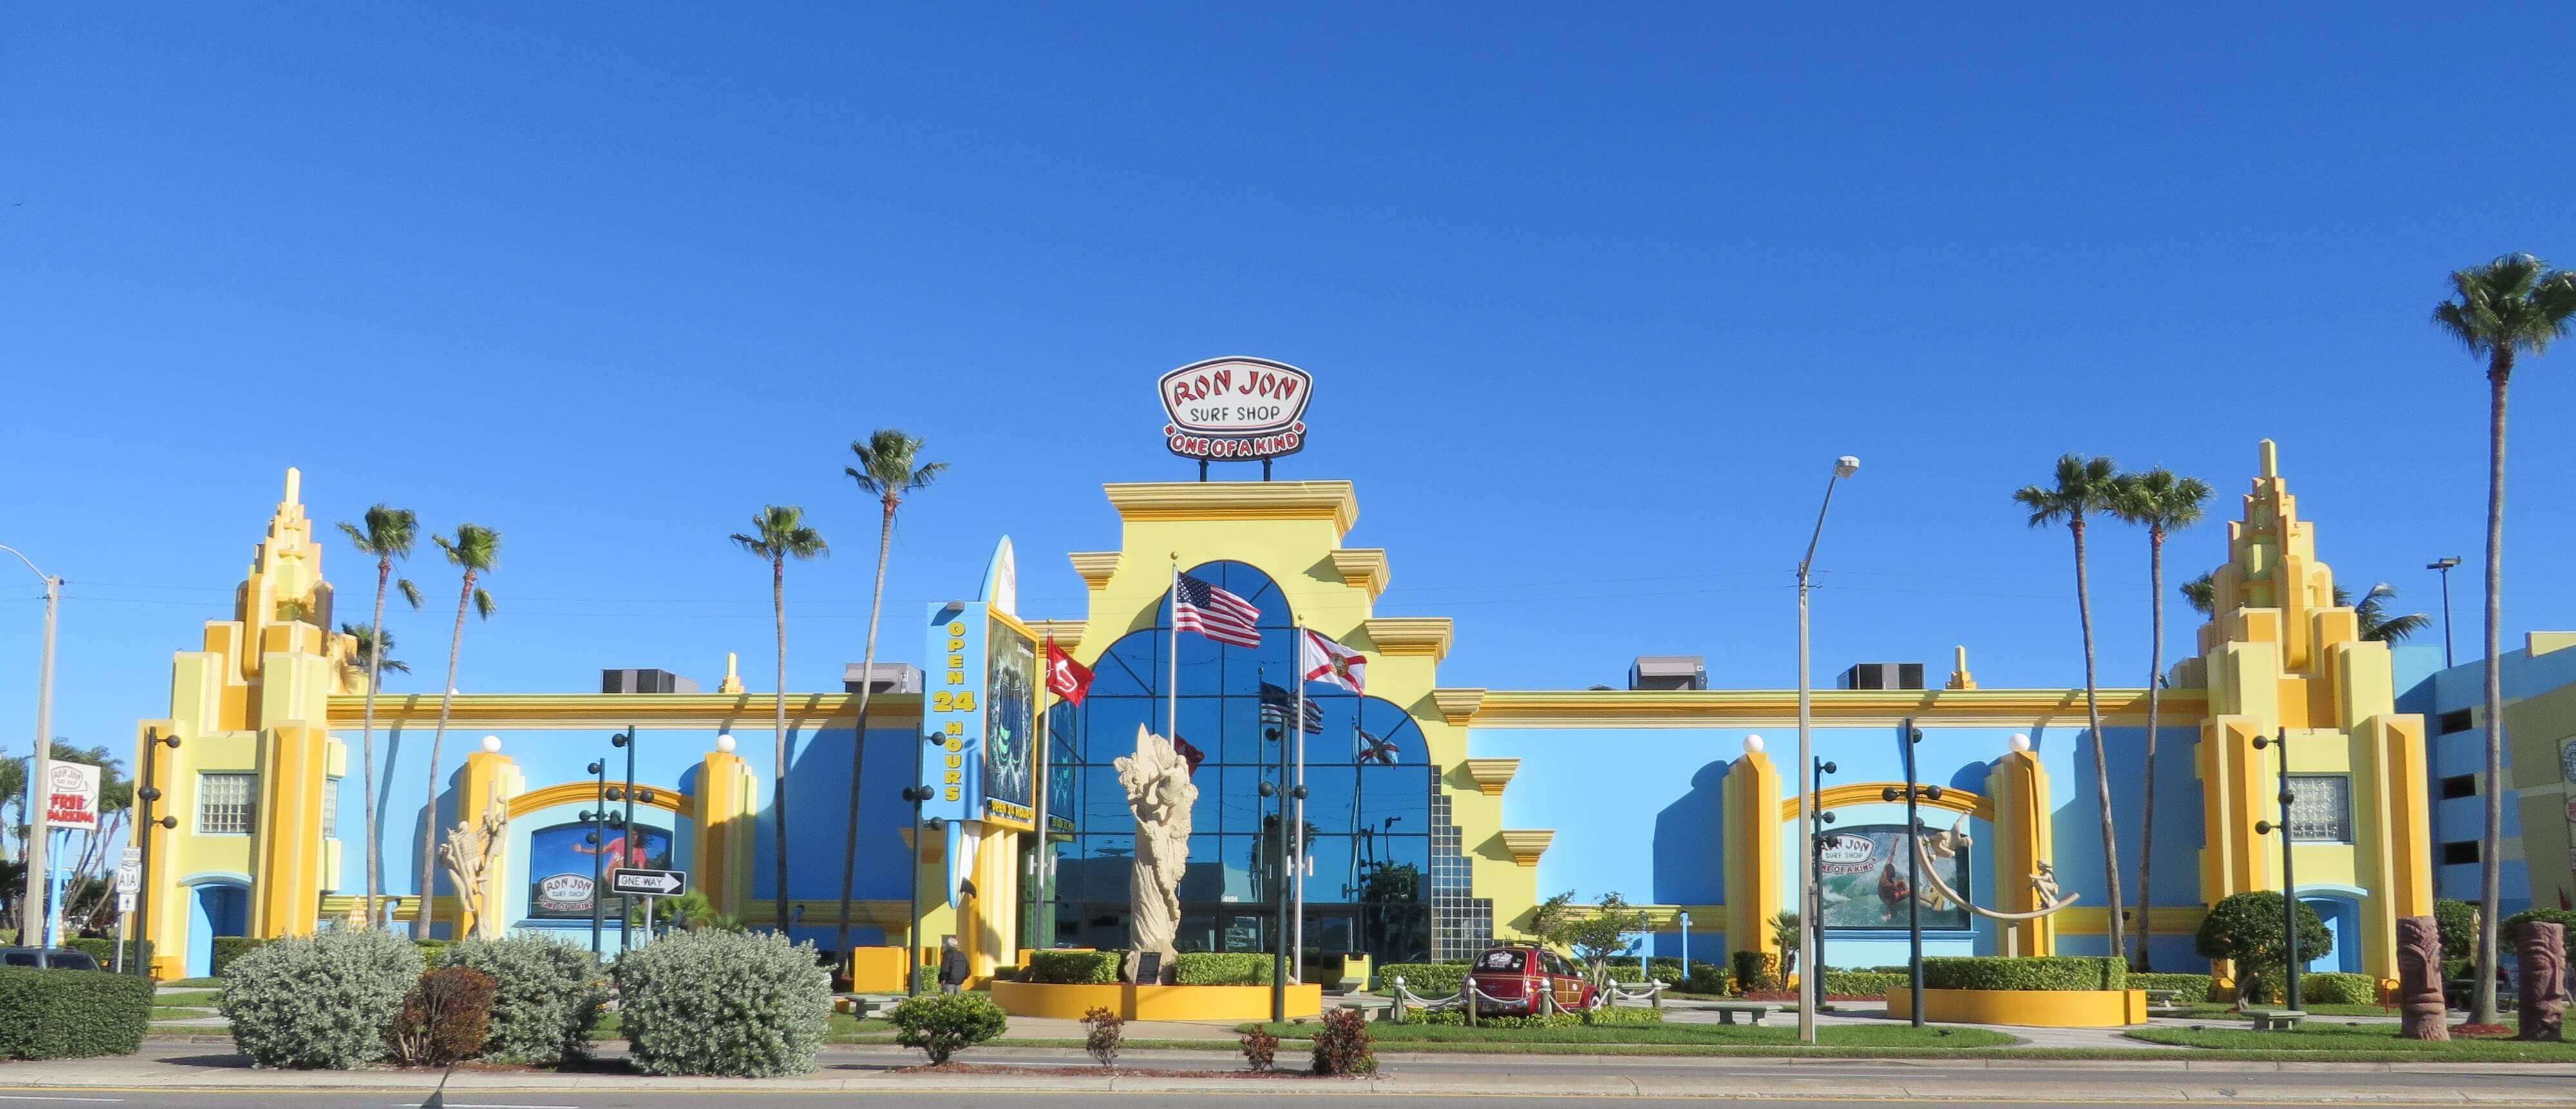 Loja Ron Jon Surf Shop em Orlando: Ron Jon Surf Shop em Cocoa Beach